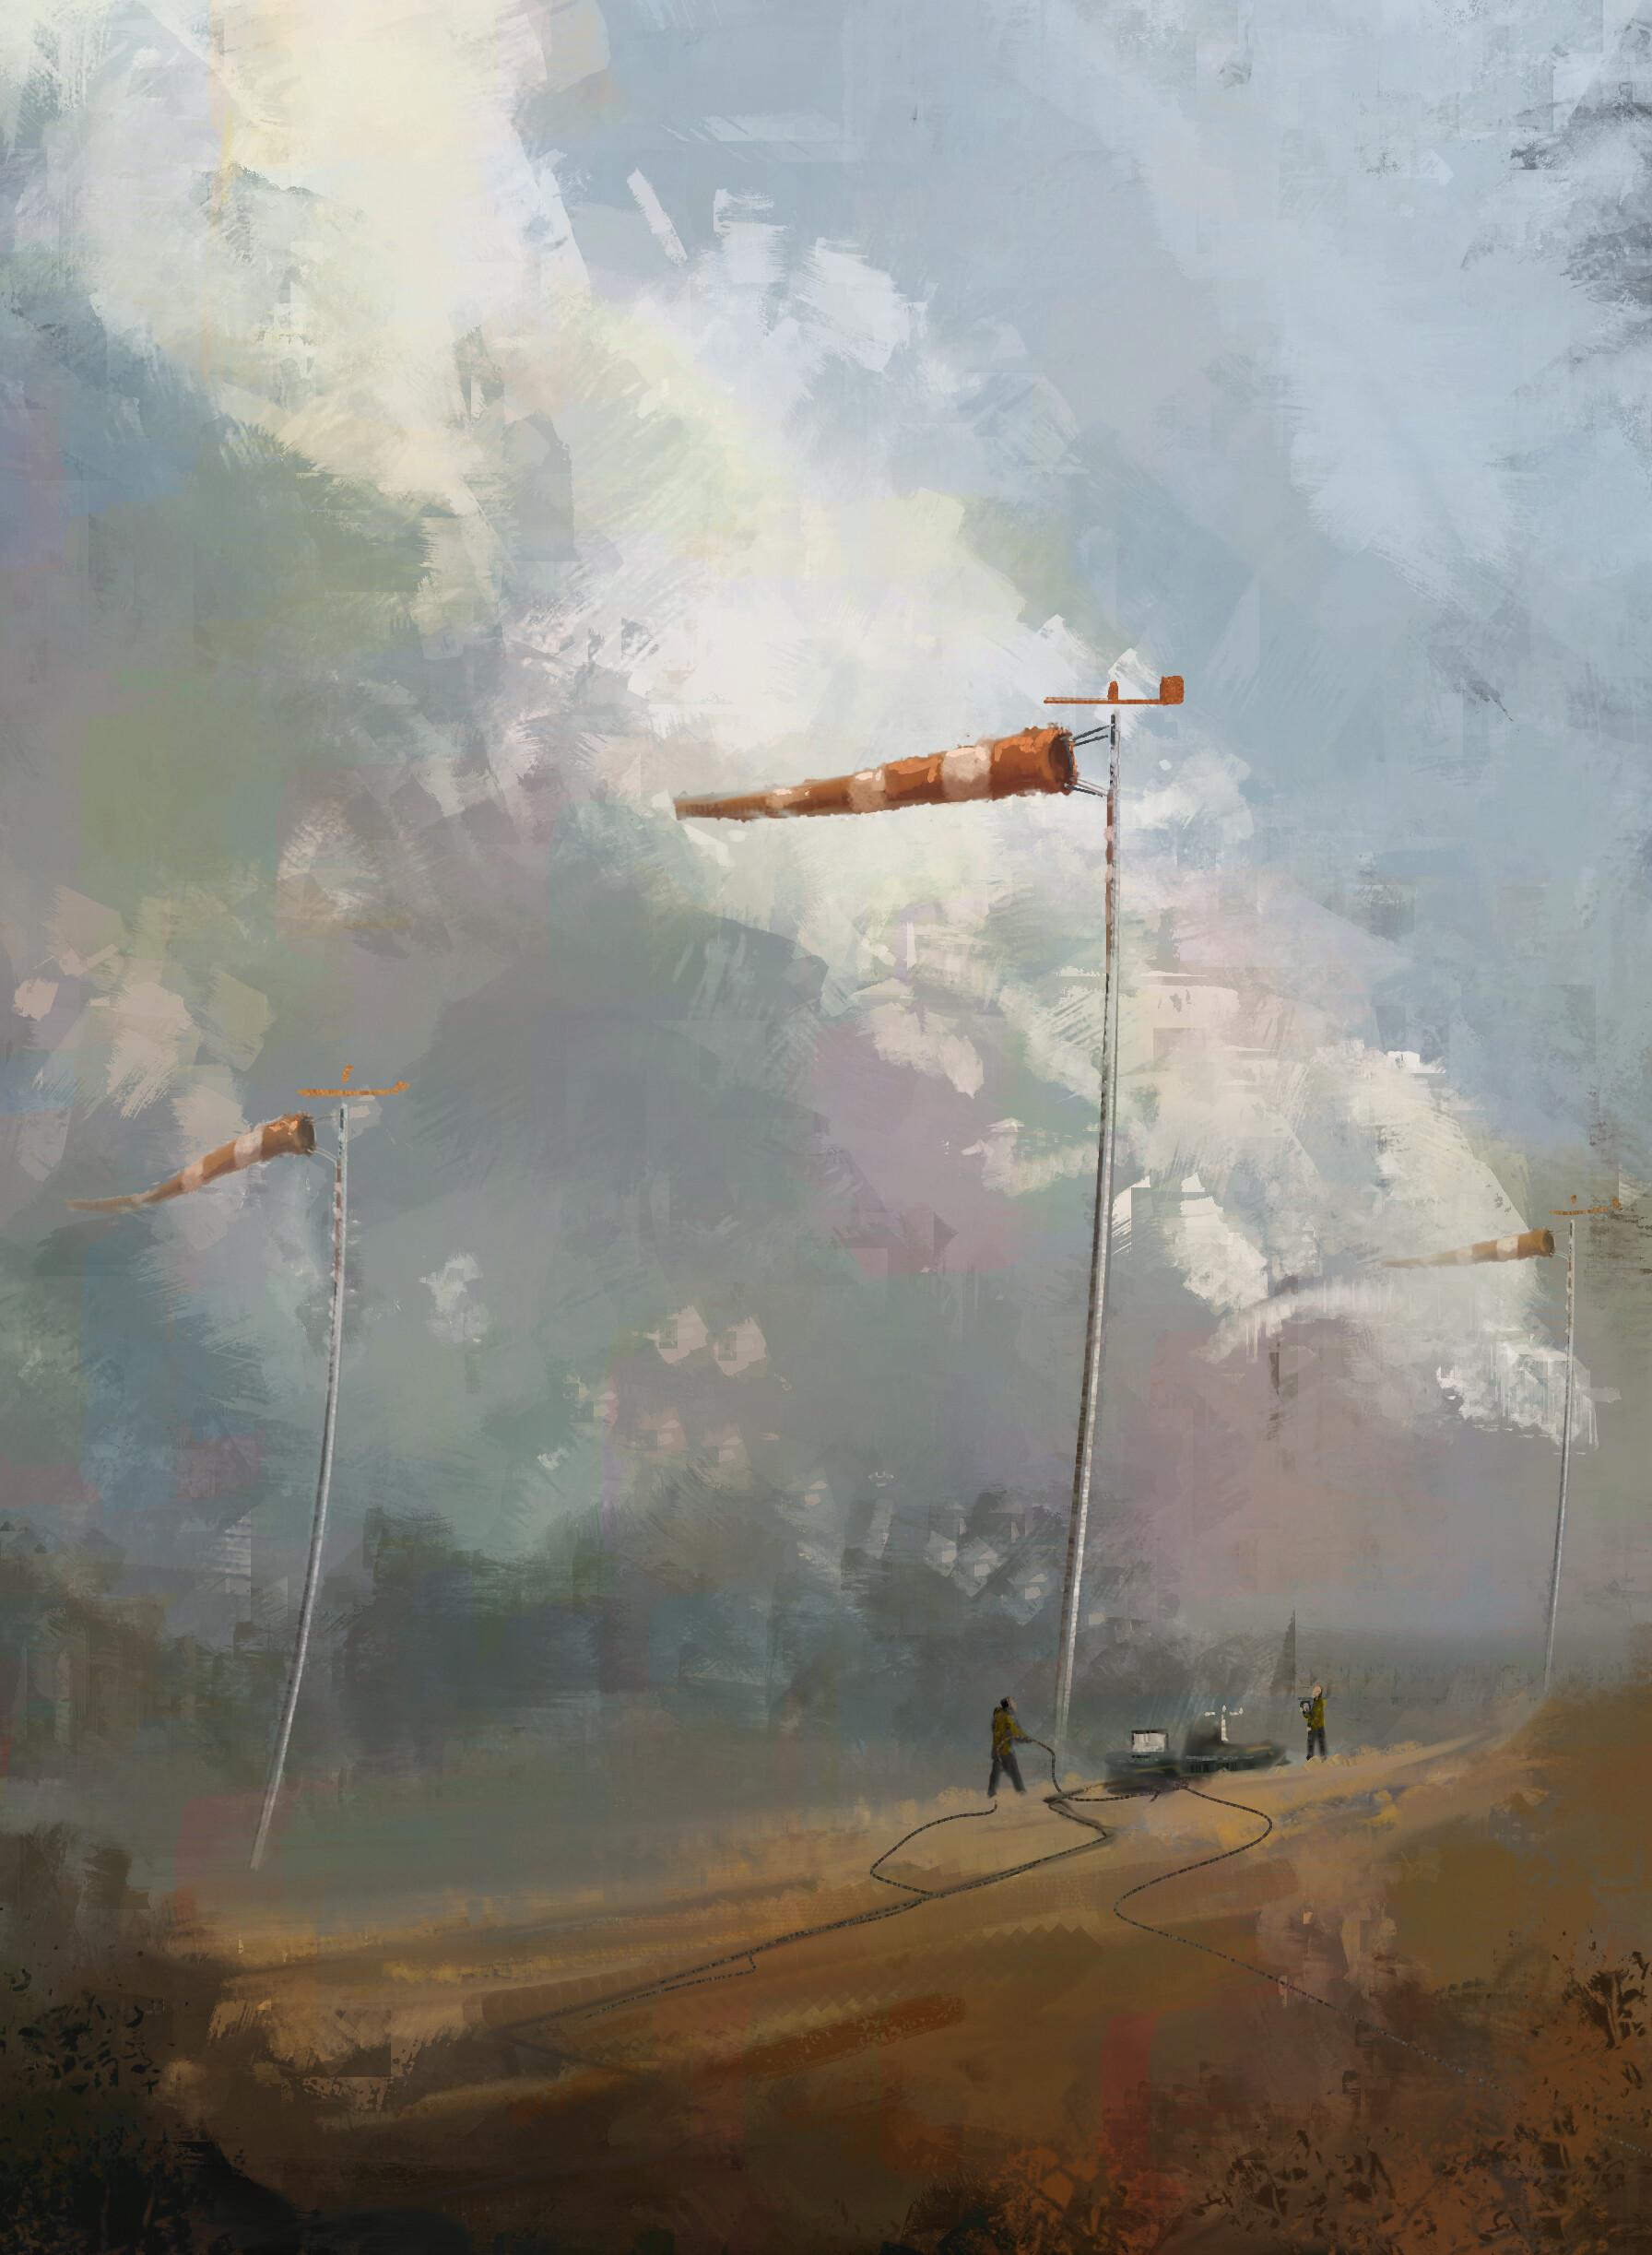 Jack dowell northen wind 2